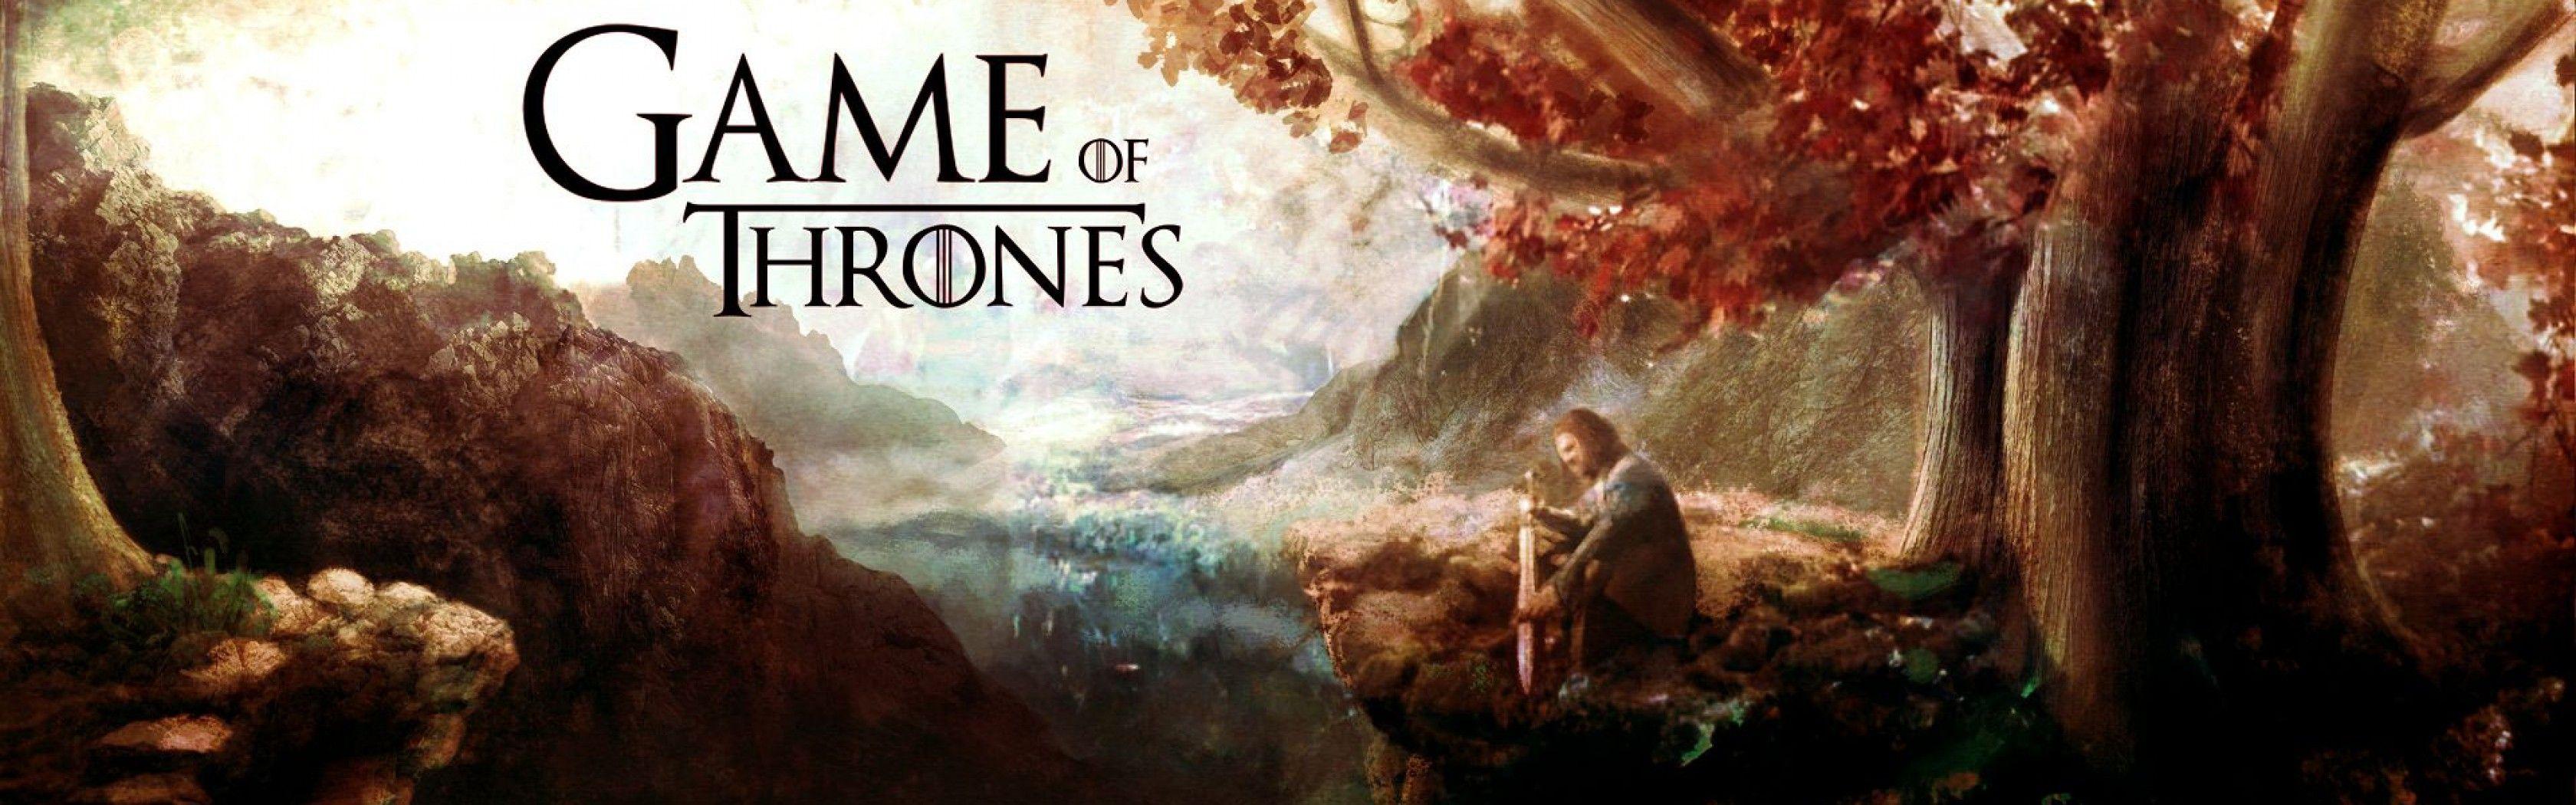 Game of thrones dual monitor wallpapers.   Juego de tronos ...